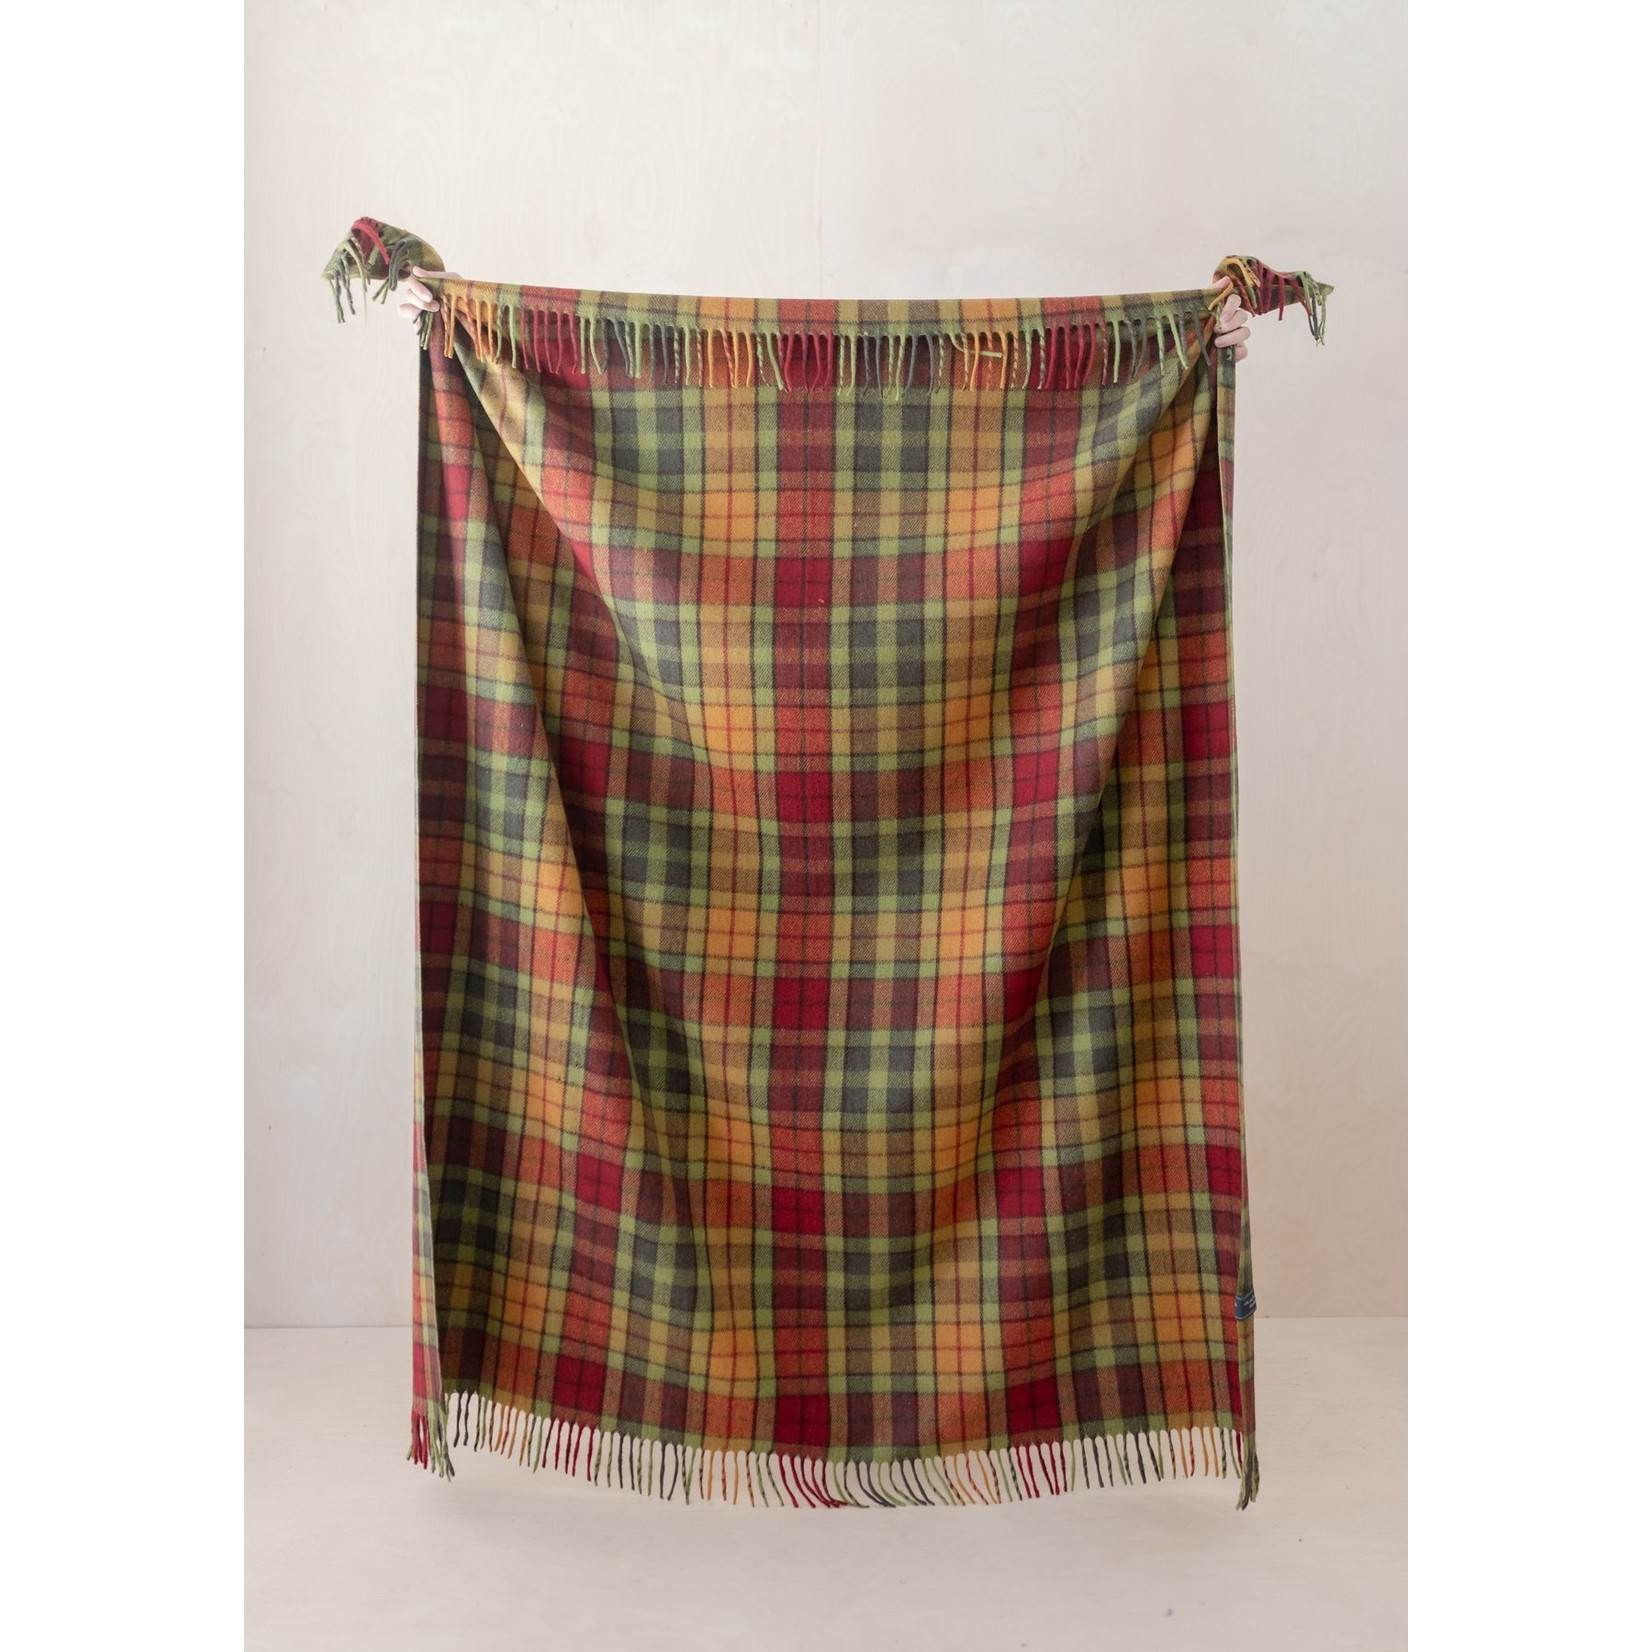 Aran Crafts Edinburgh 4812AUTB Wool Throw - Autumn Buchanan